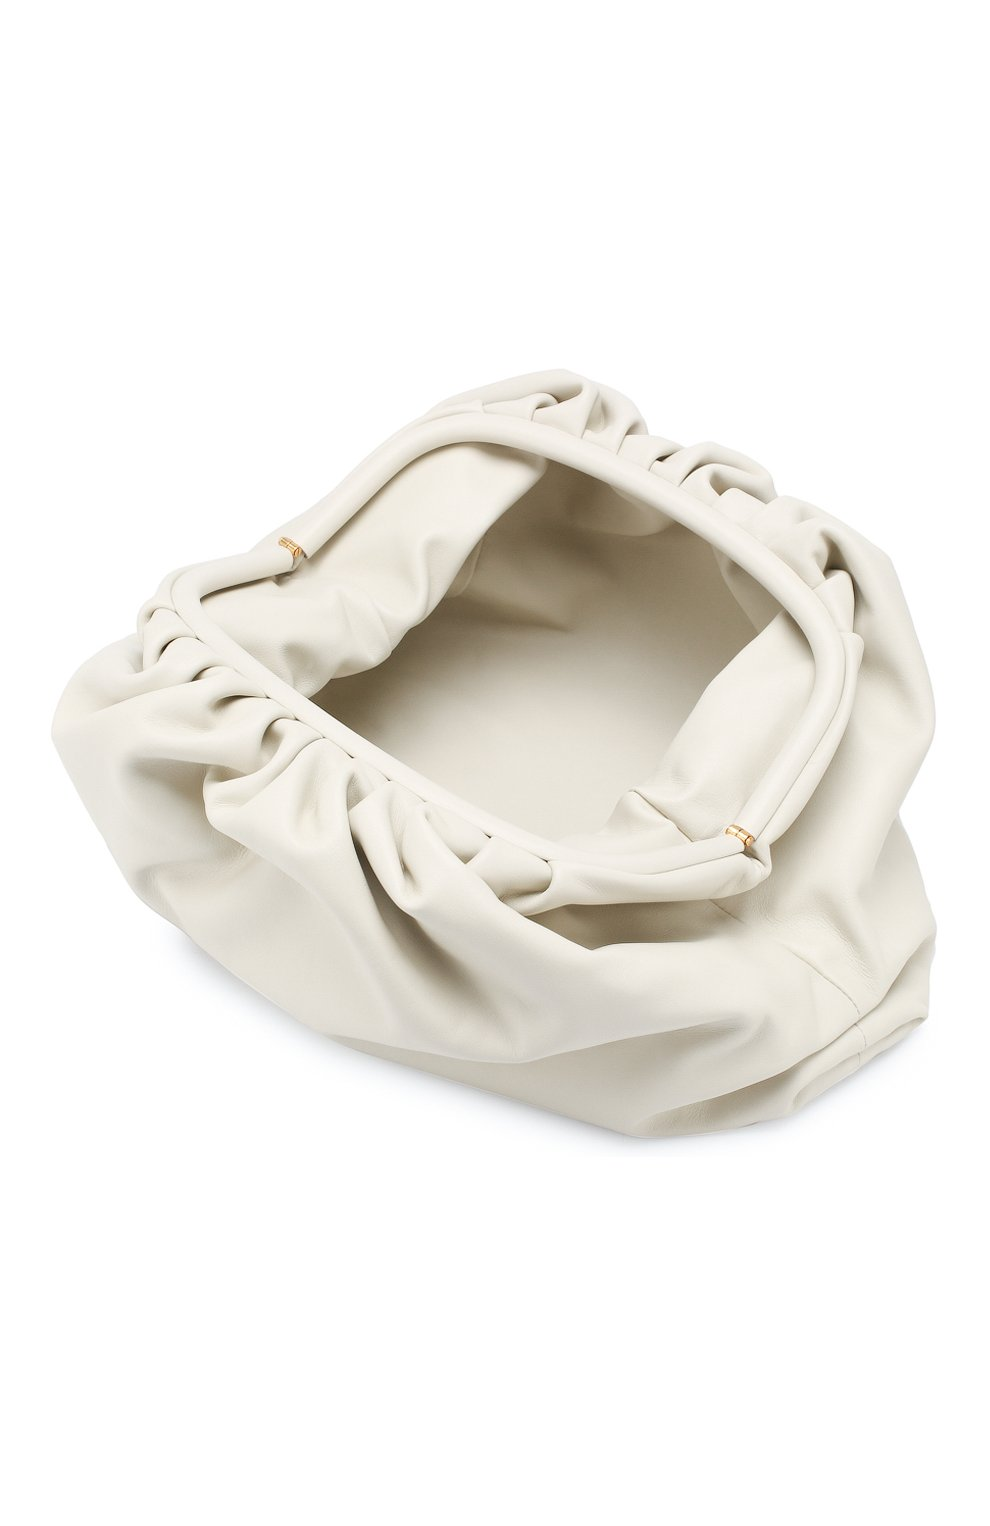 Женский клатч pouch BOTTEGA VENETA белого цвета, арт. 576227/VCP40   Фото 4